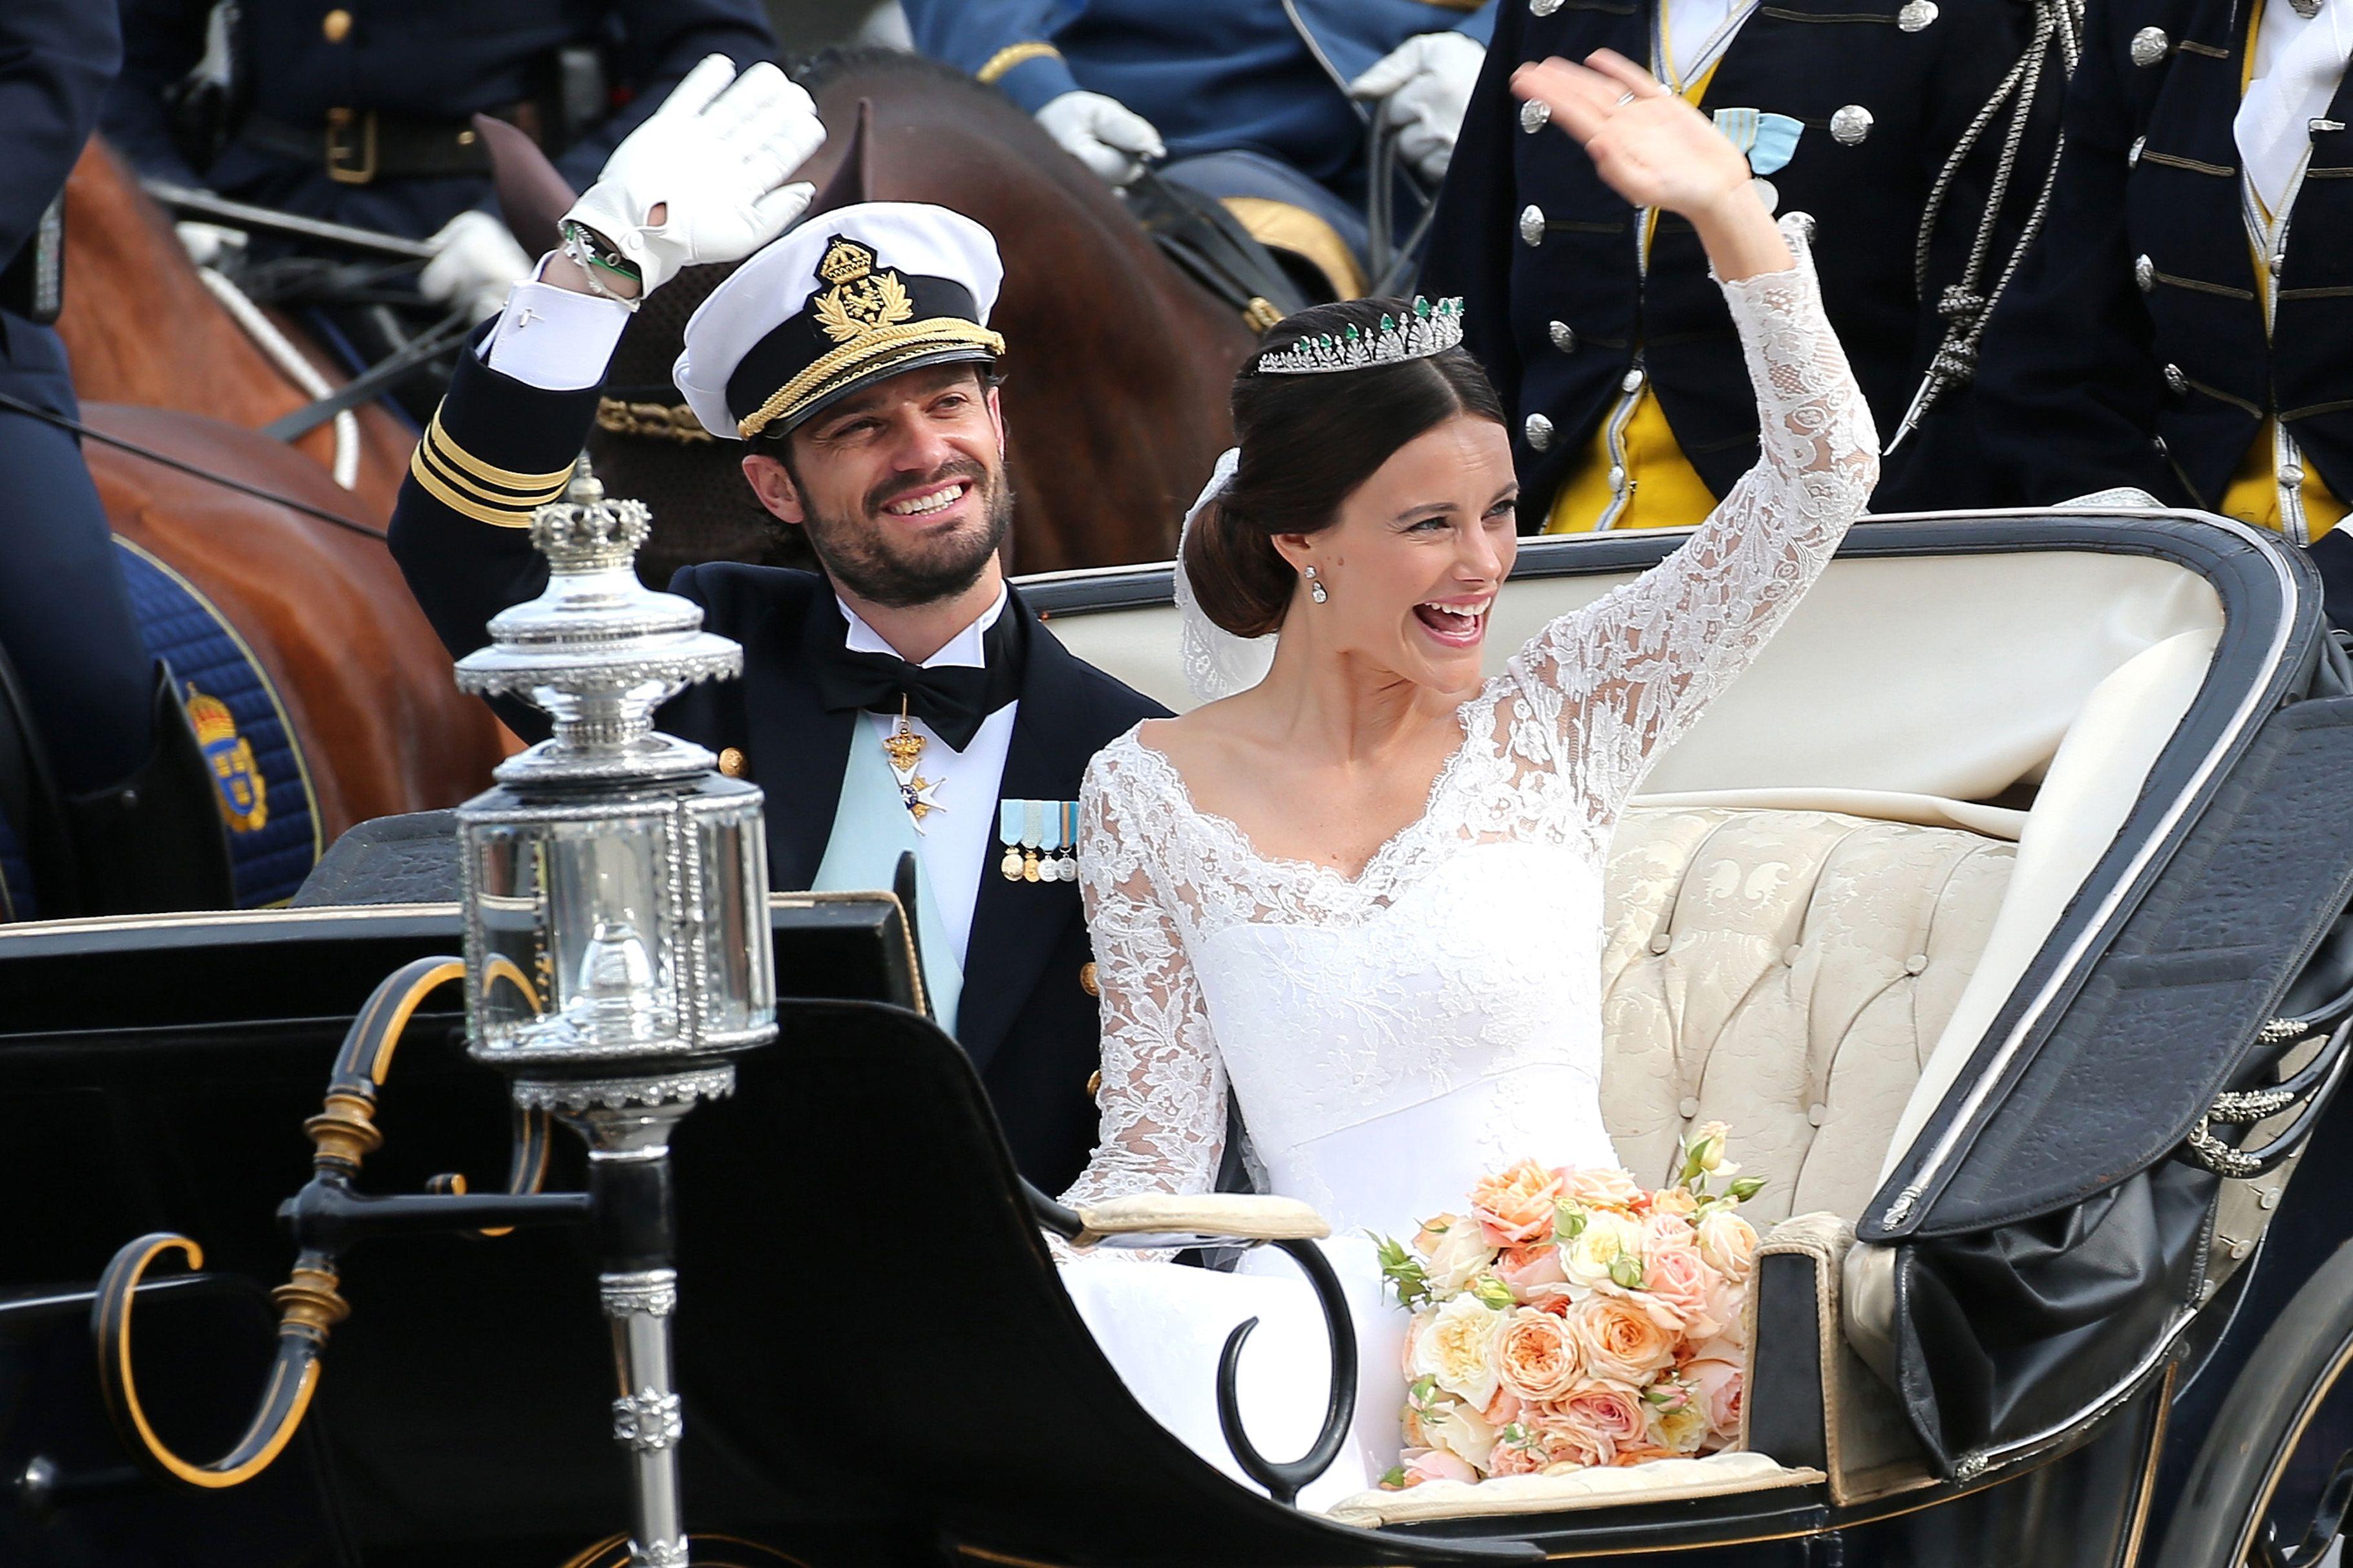 prince carl wedding